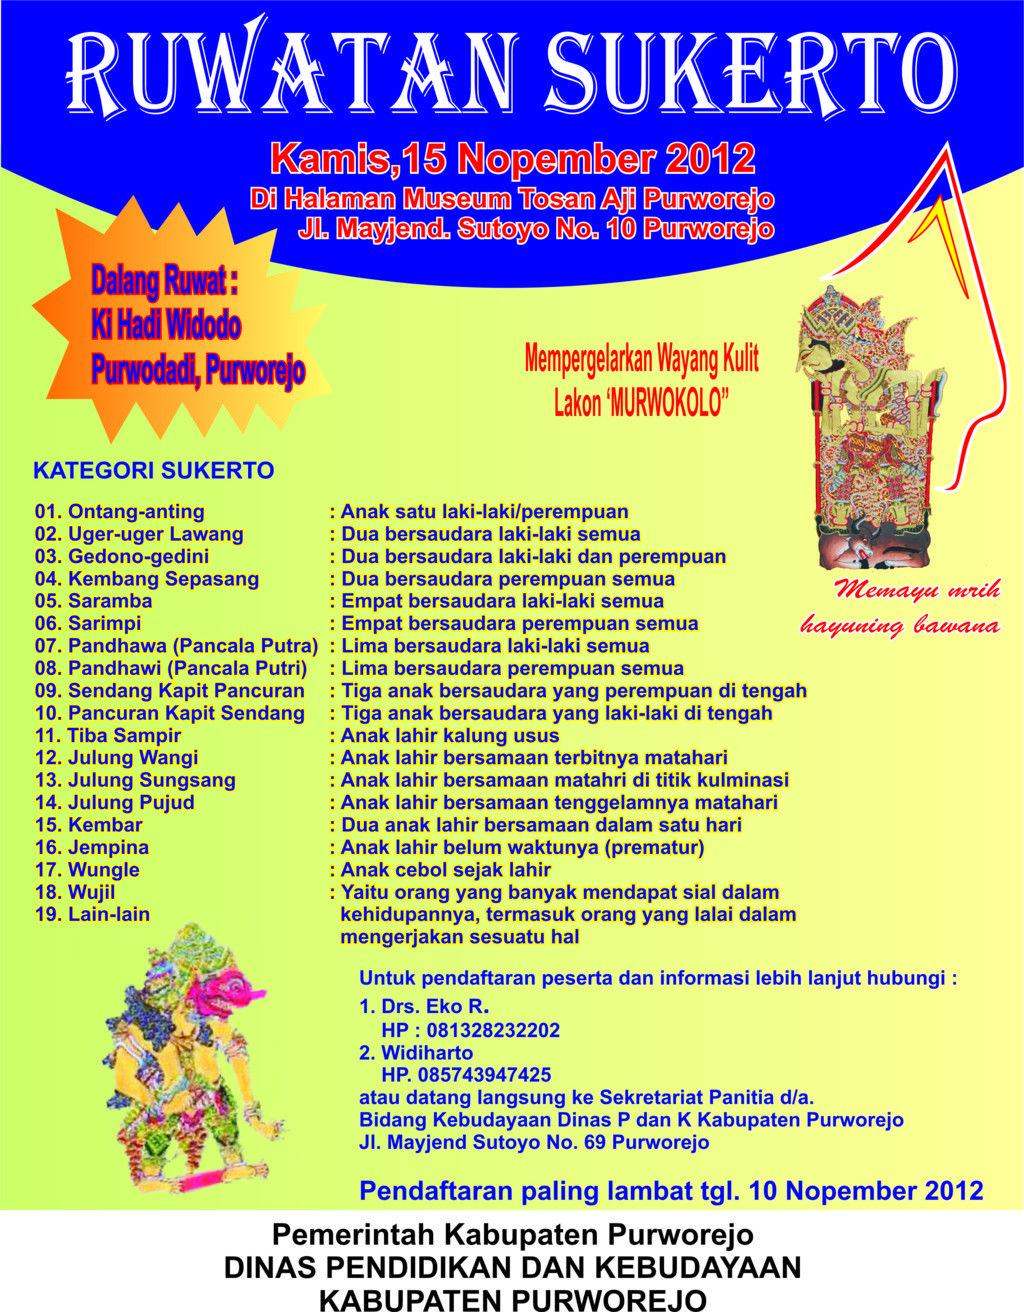 Budaya Purworejo Ruwatan Sukerto Jamasan Tosan Aji 2012 Museum Kab